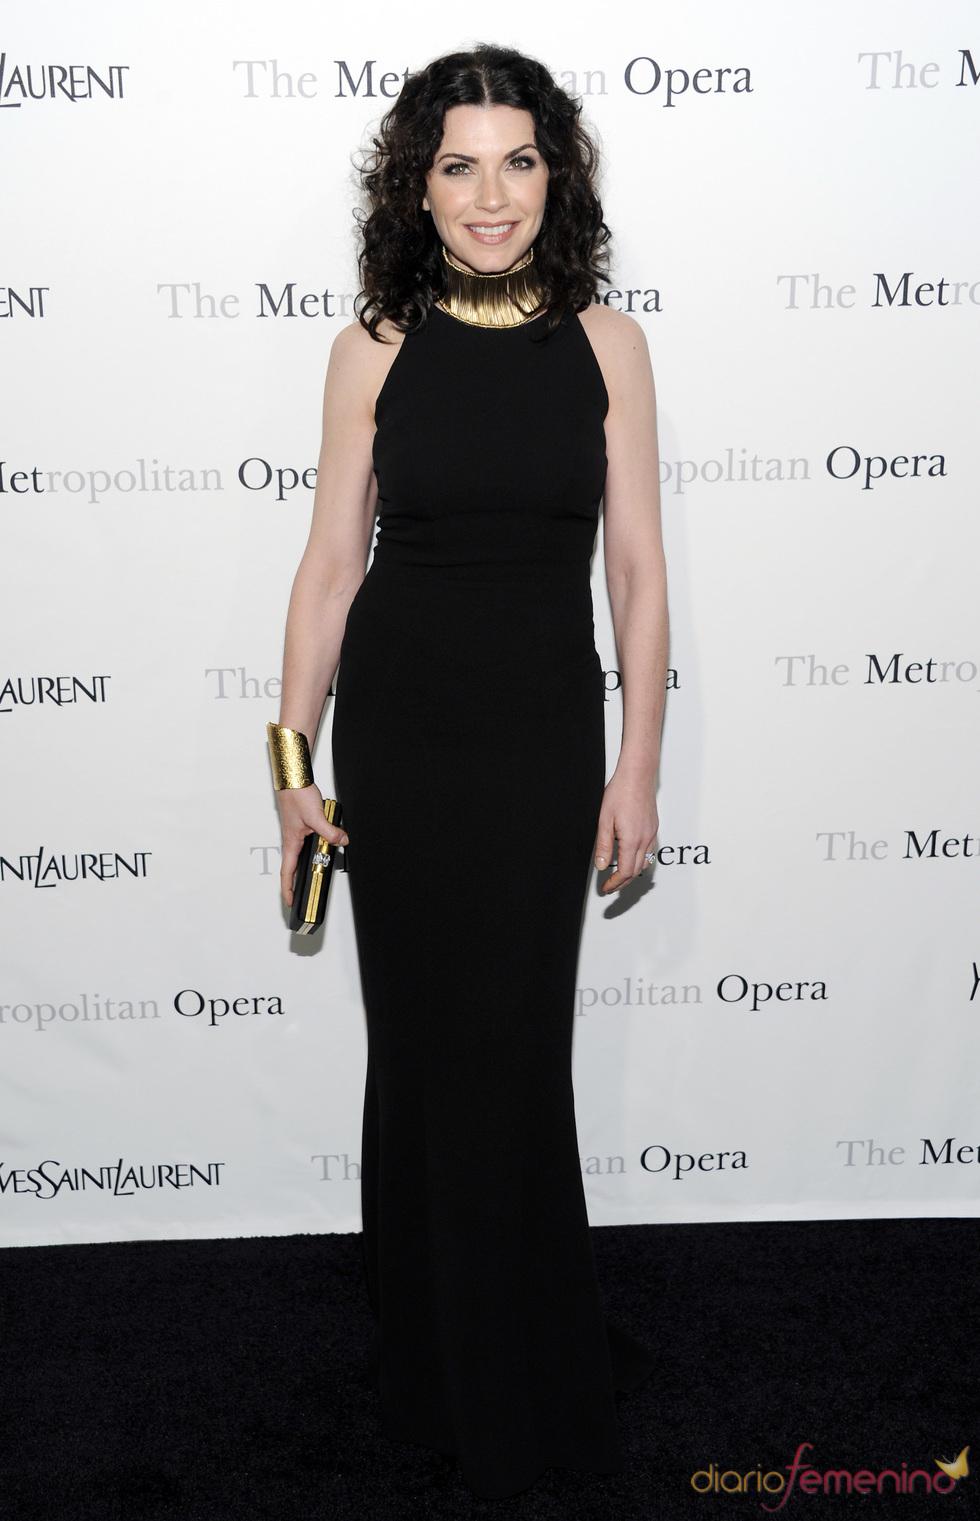 Julianna Margulies en la premiere 'Le Comte Ory' de Rossini